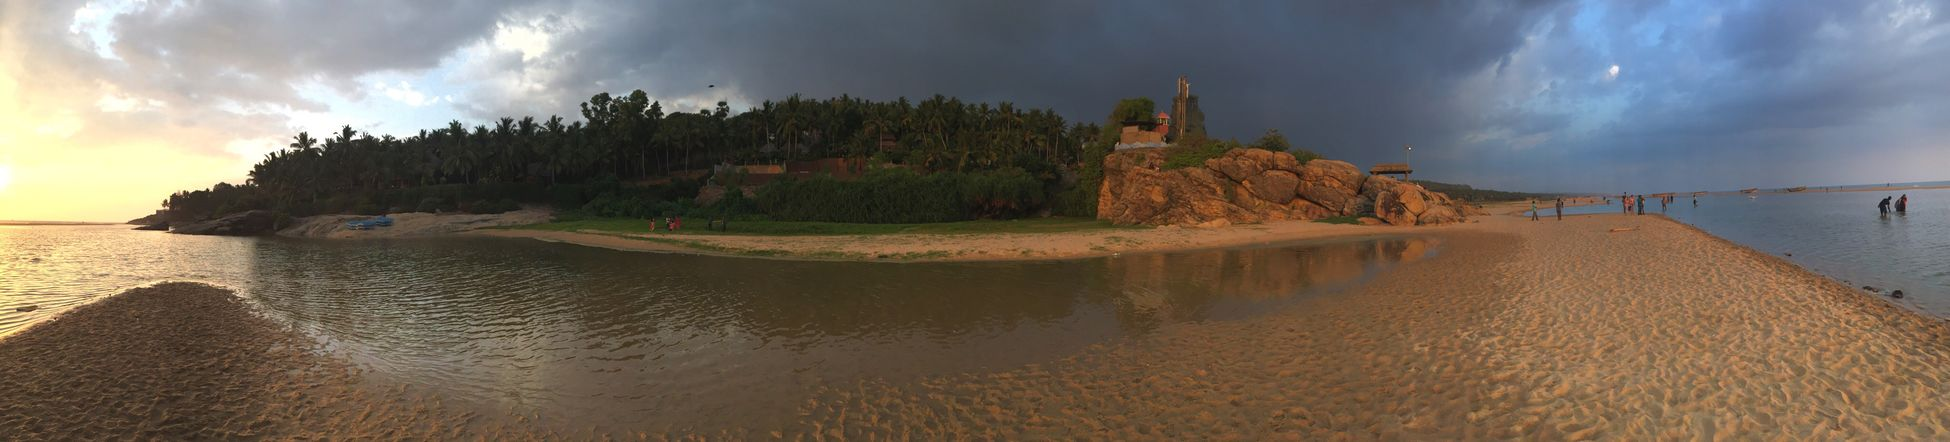 The City Light Kerala Trivandrum